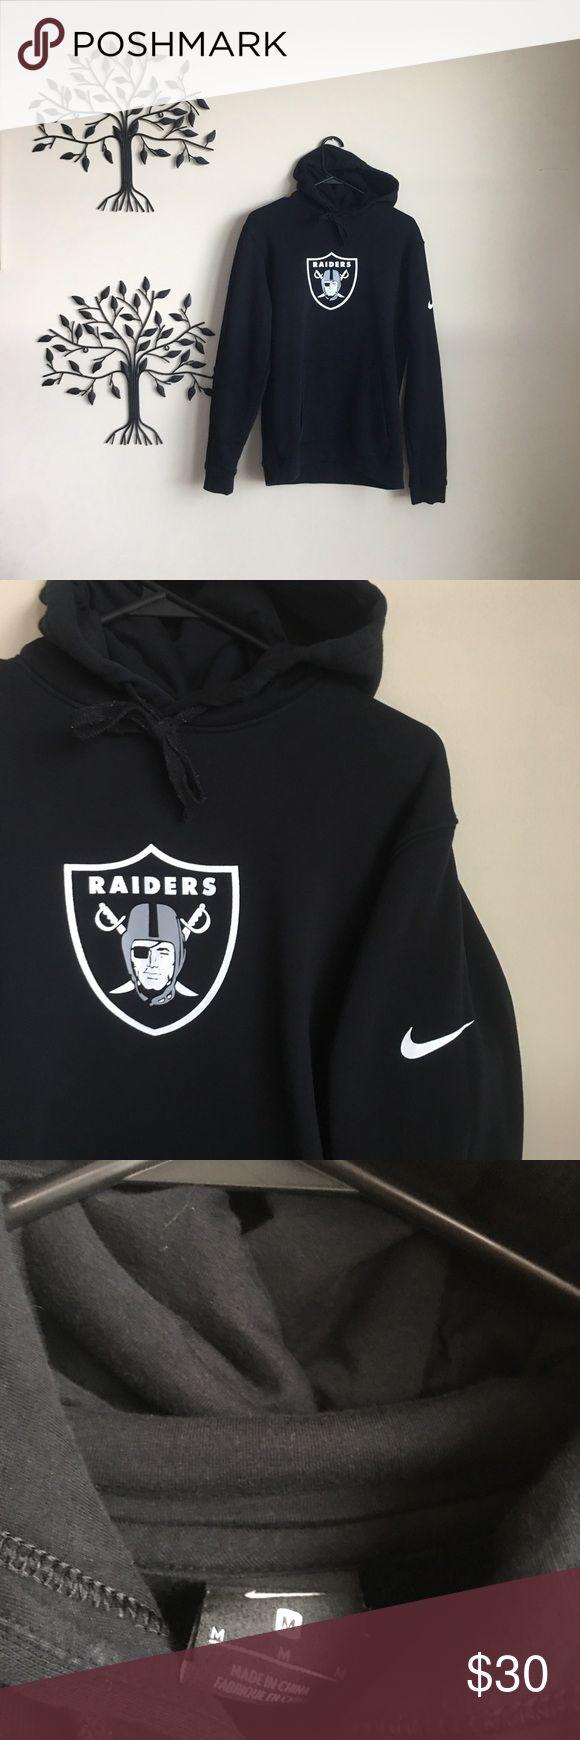 Nike NFL Oakland Raiders Hoodie Very Nice Nike Oakland Raiders NFL Hoodie   Color is Black With White Logo   Size men's Medium Nike Shirts Sweatshirts & Hoodies